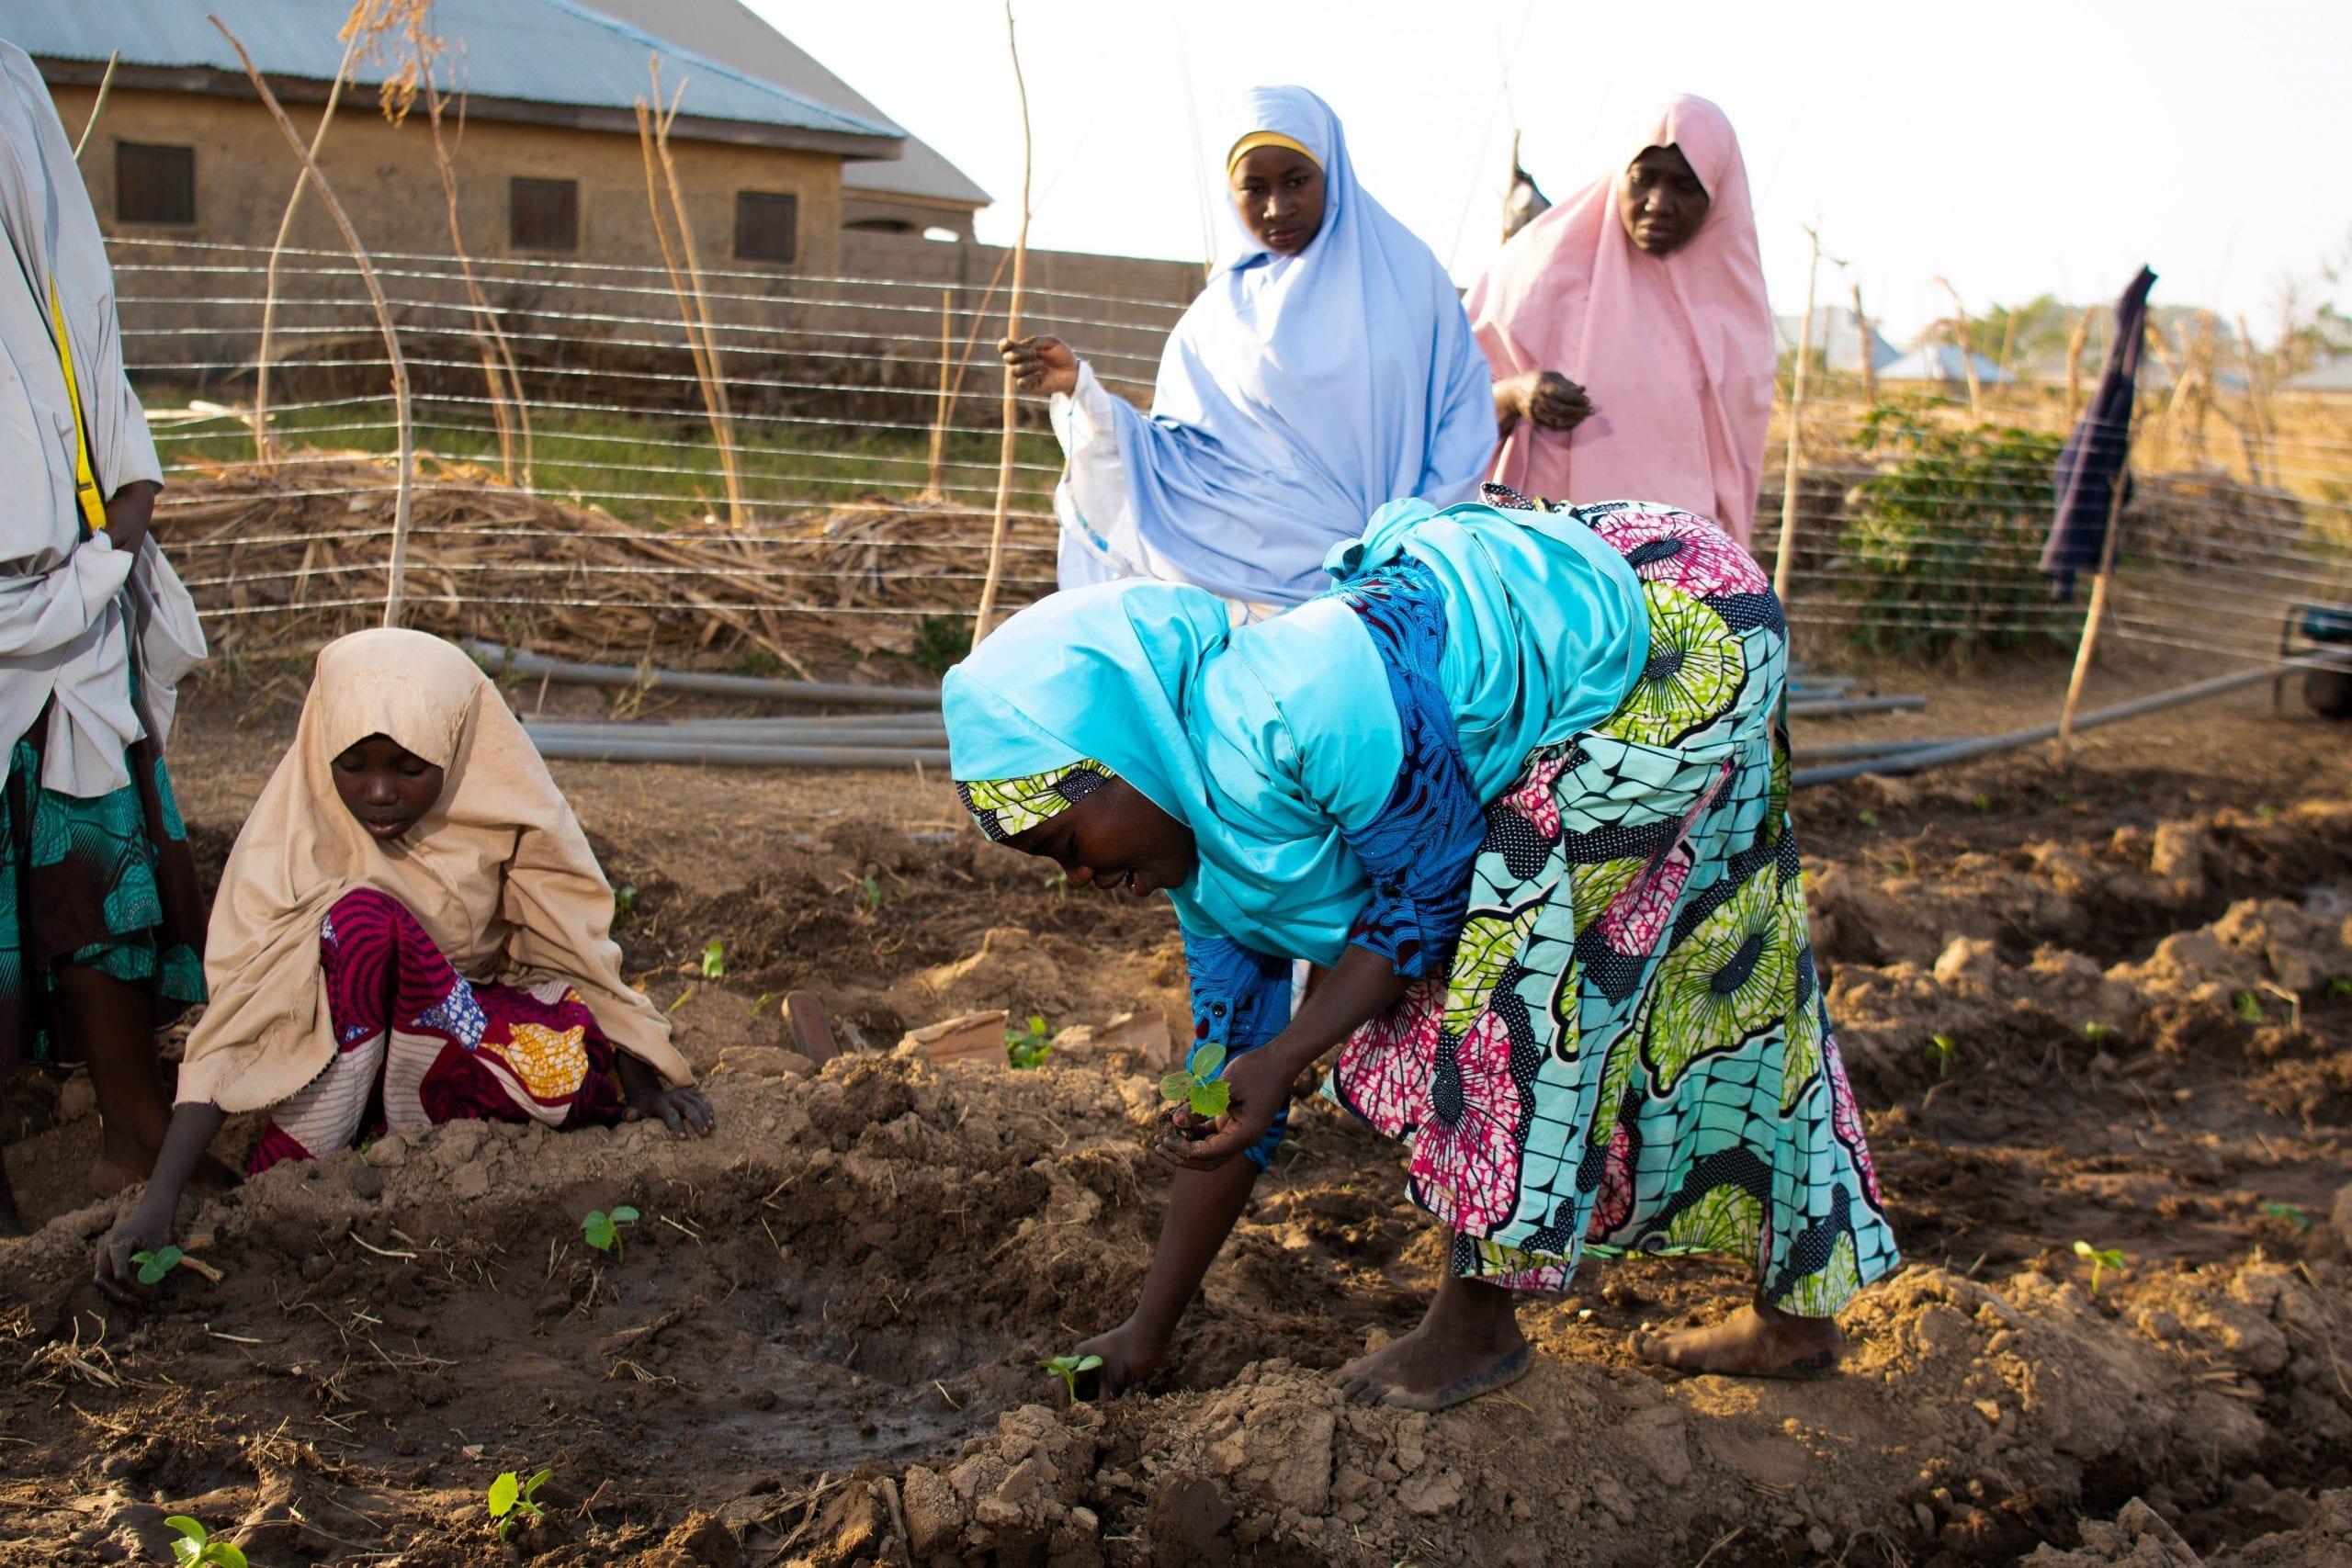 Women tomato farmers in northwest Nigeria